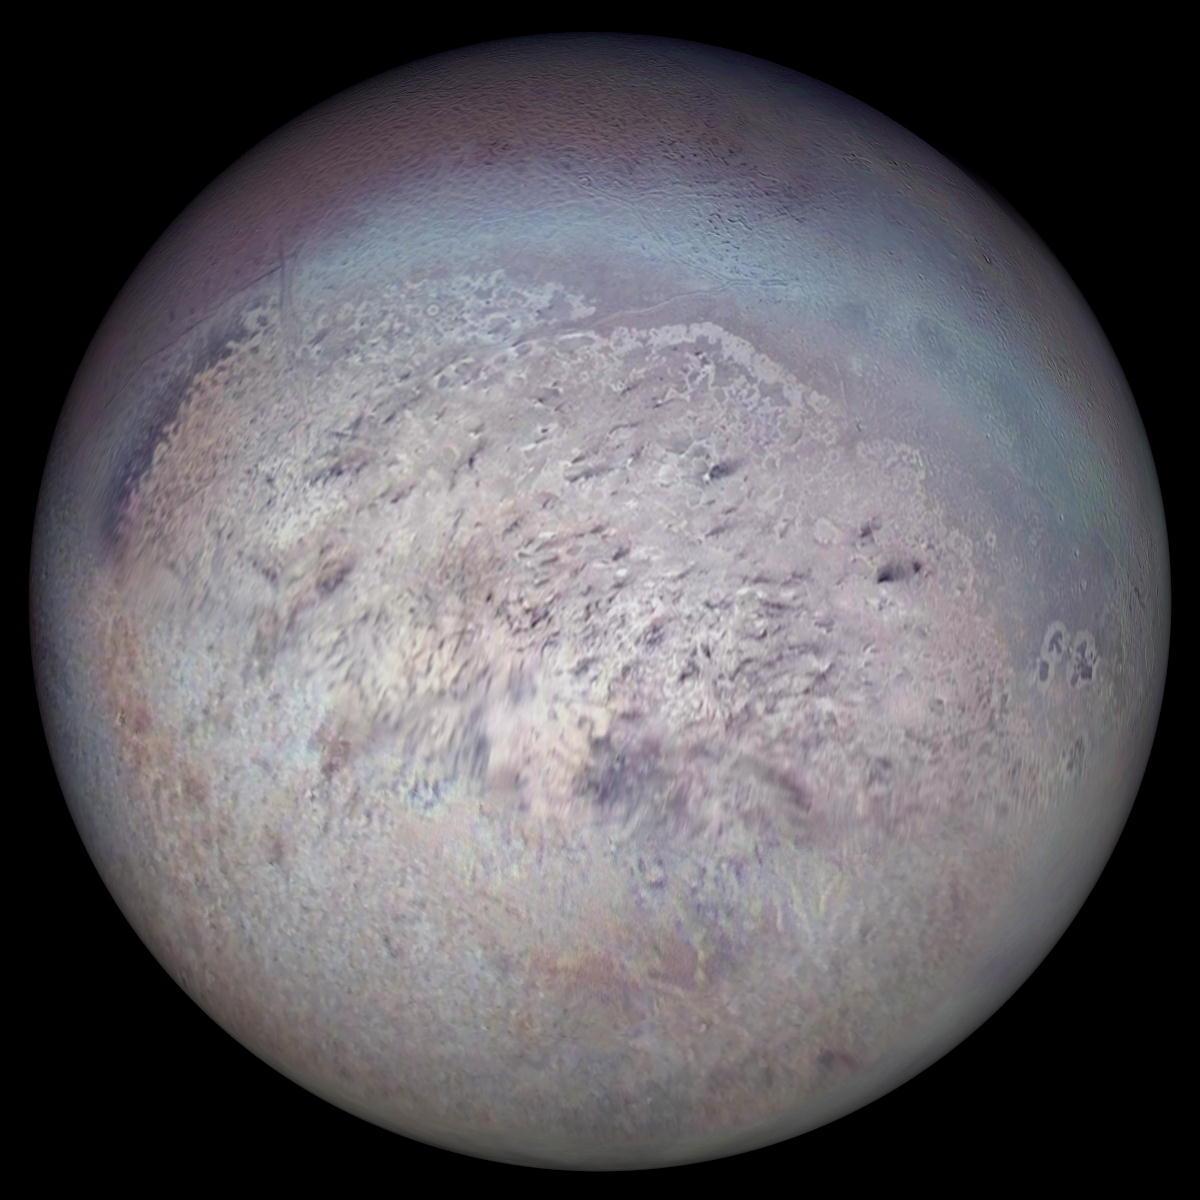 Global Views Wikipedia: Neptune's Satellite, Unusual Moon, Dwarf Planet